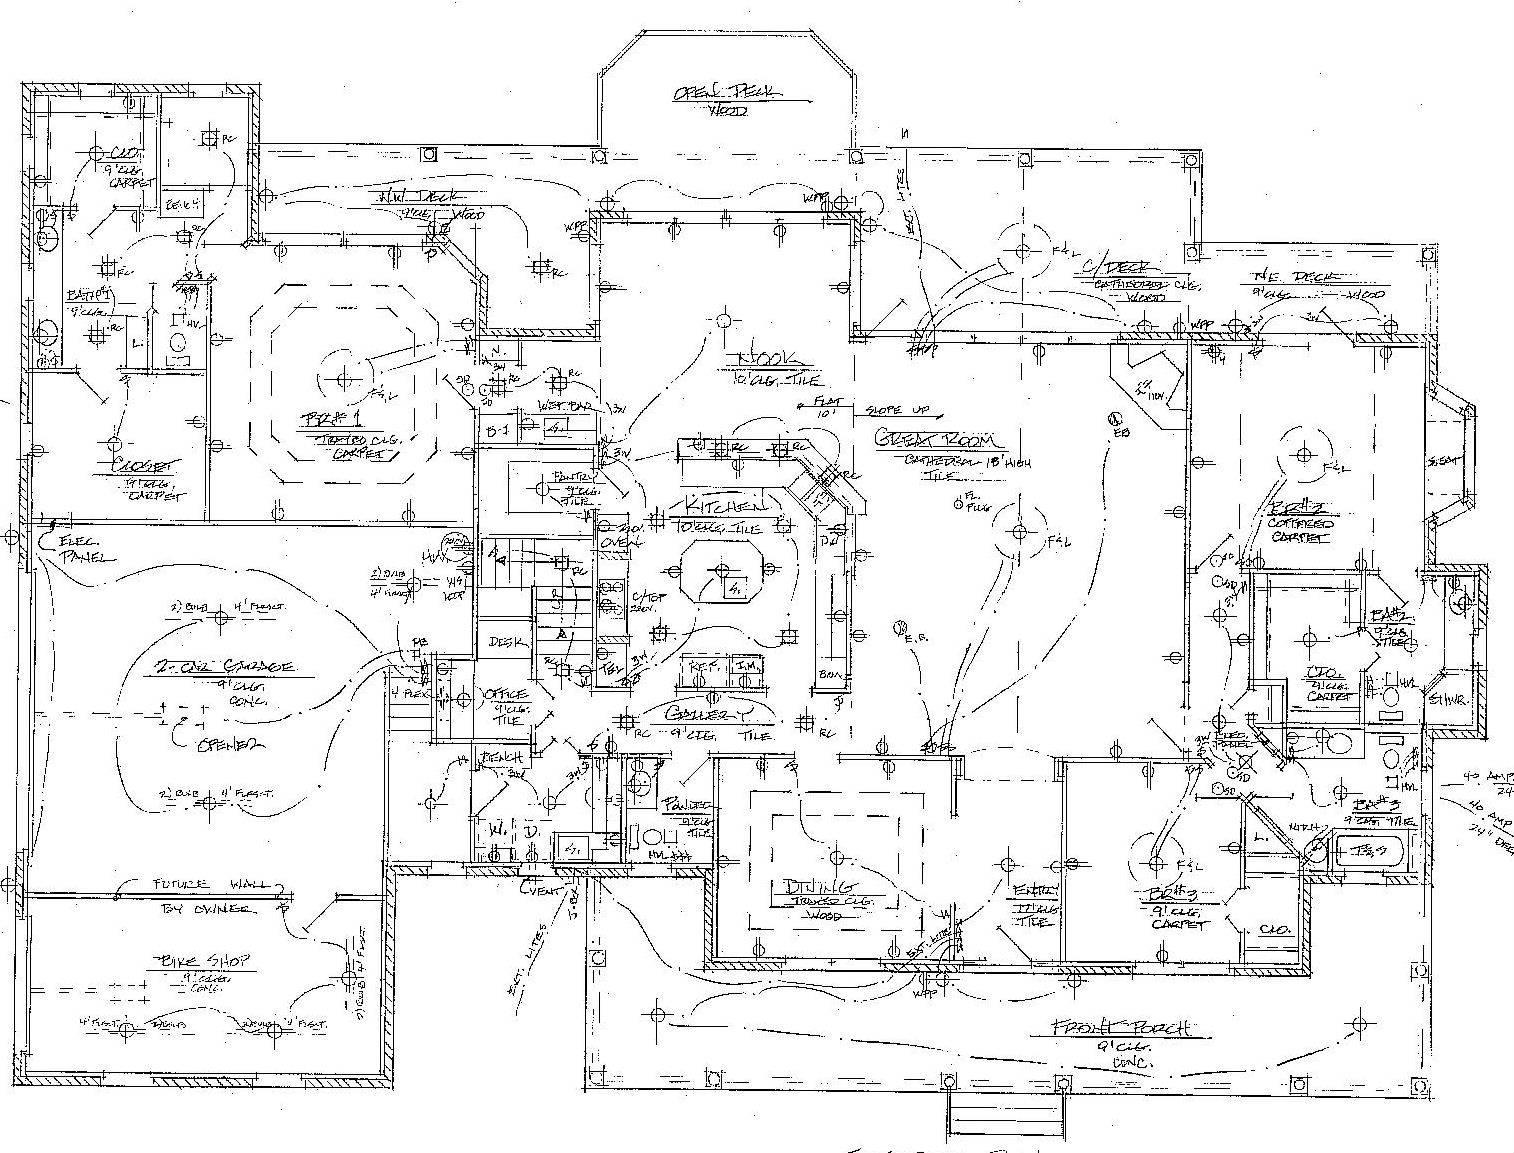 House Wiring Plans Floor Plan Electrical Diagram398000